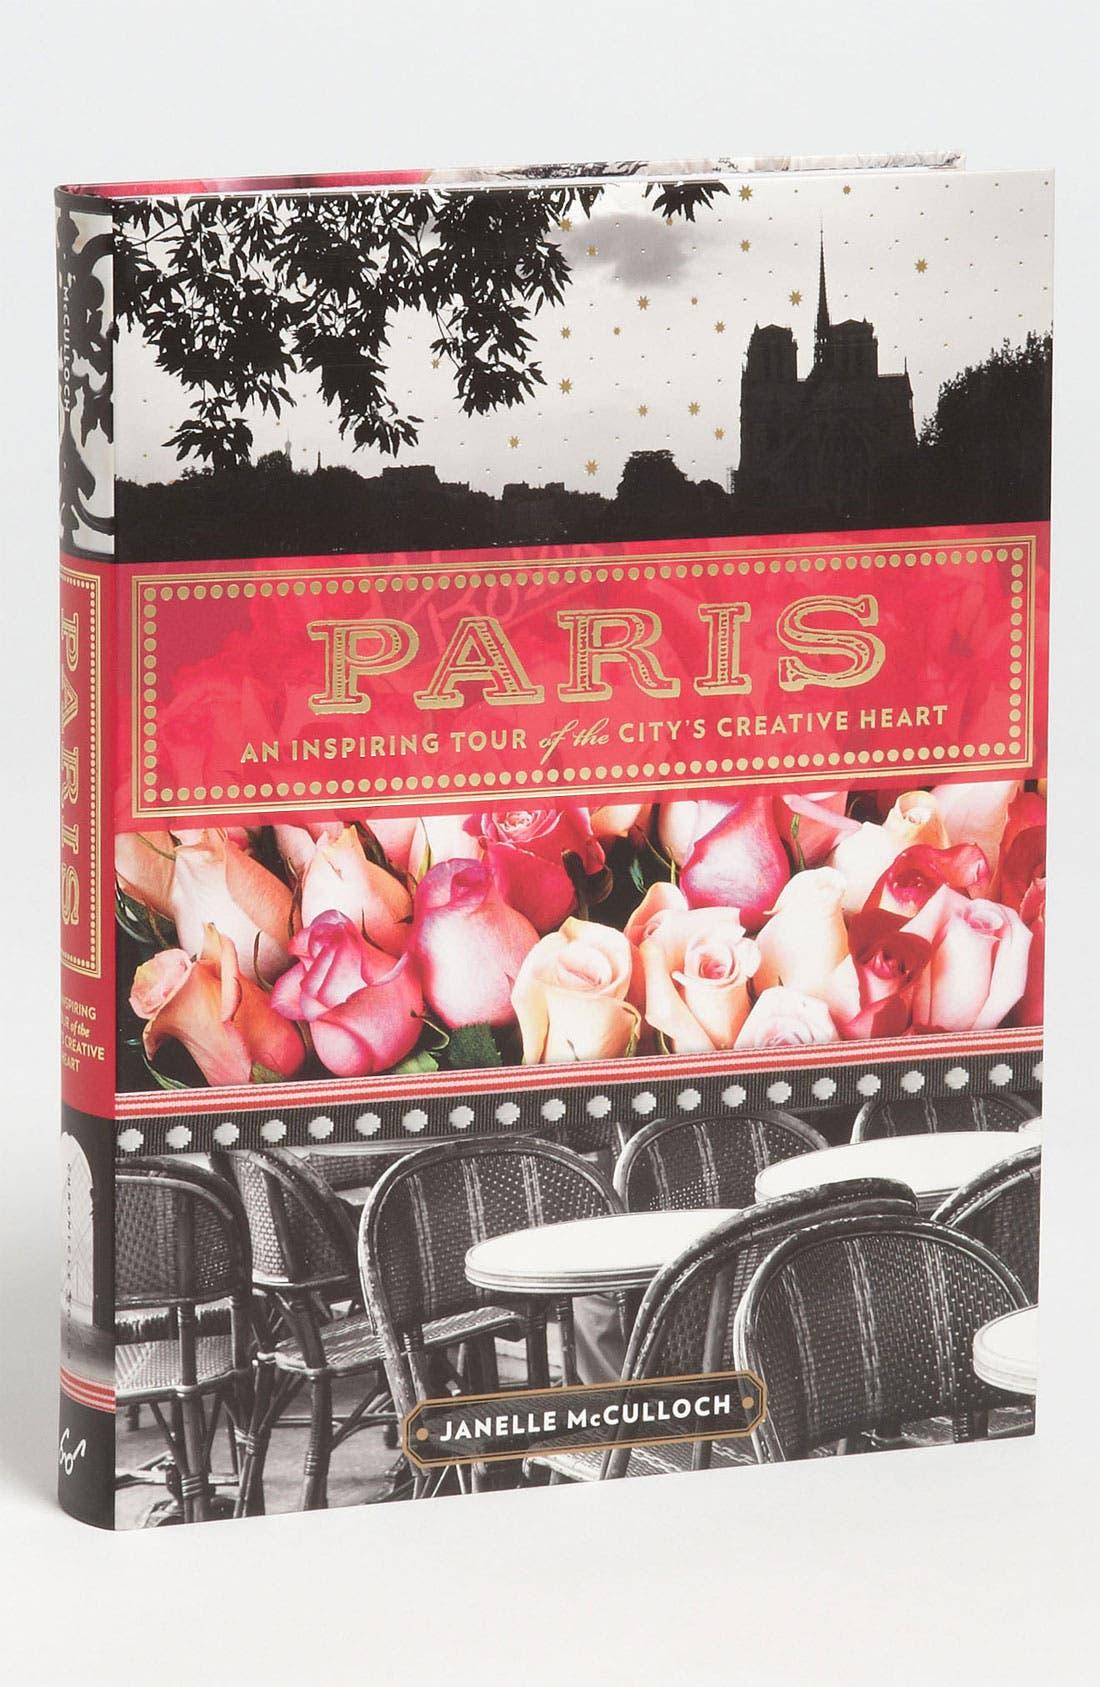 Alternate Image 1 Selected - 'Paris: An Inspiring Tour of the City's Creative Heart'